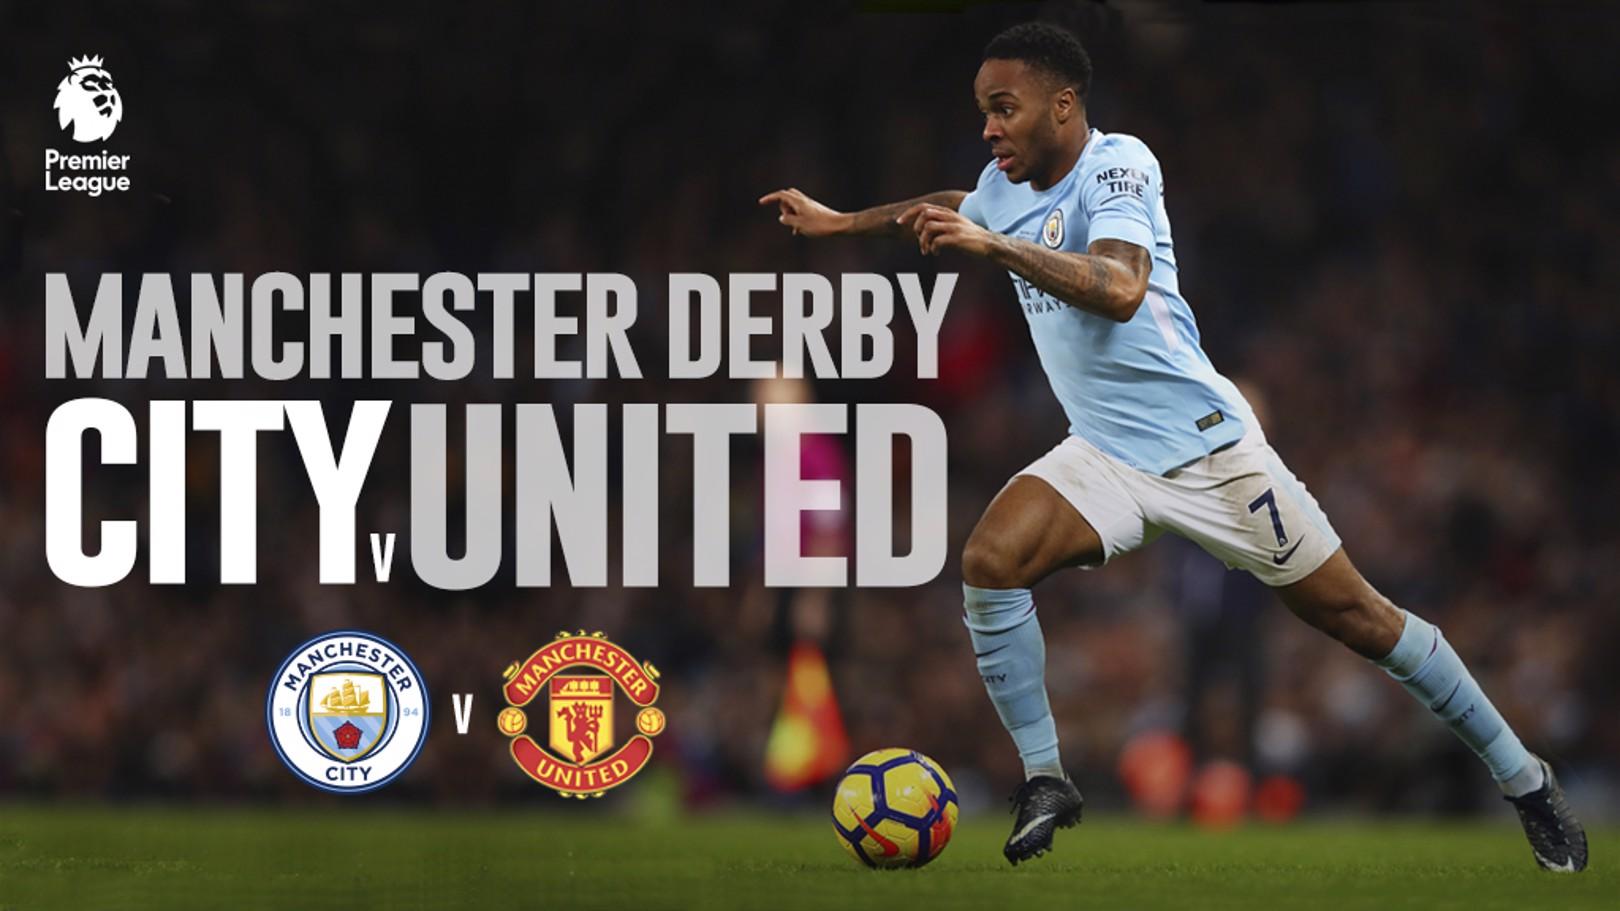 City vs United : En direct !